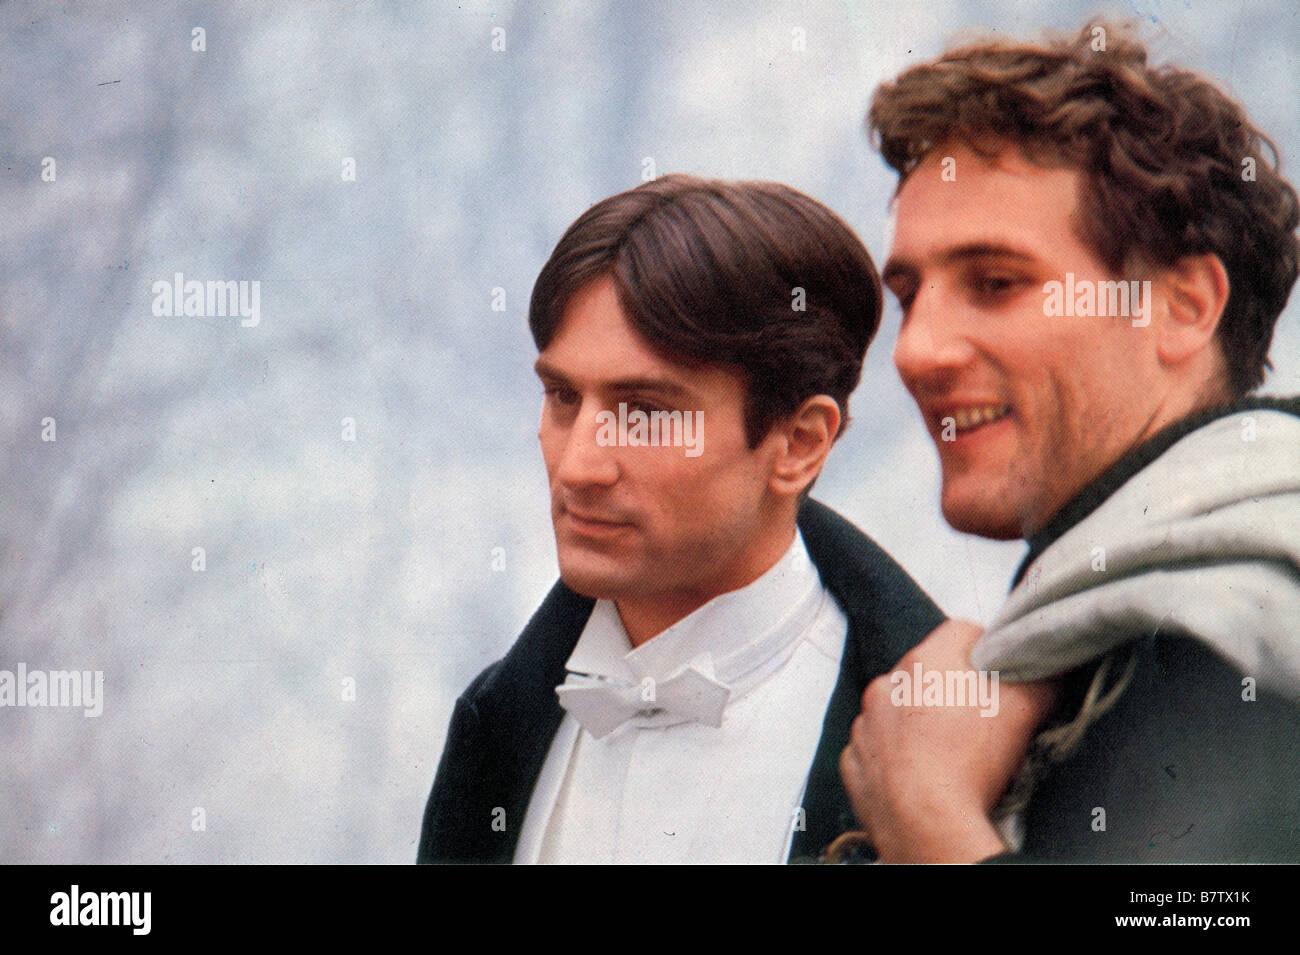 ¿Cuánto mide Gerard Depardieu? - Altura - Real height Novecento-ano-1976-italia-robert-de-niro-gerard-depardieu-director-bernardo-bertolucci-b7tx1k